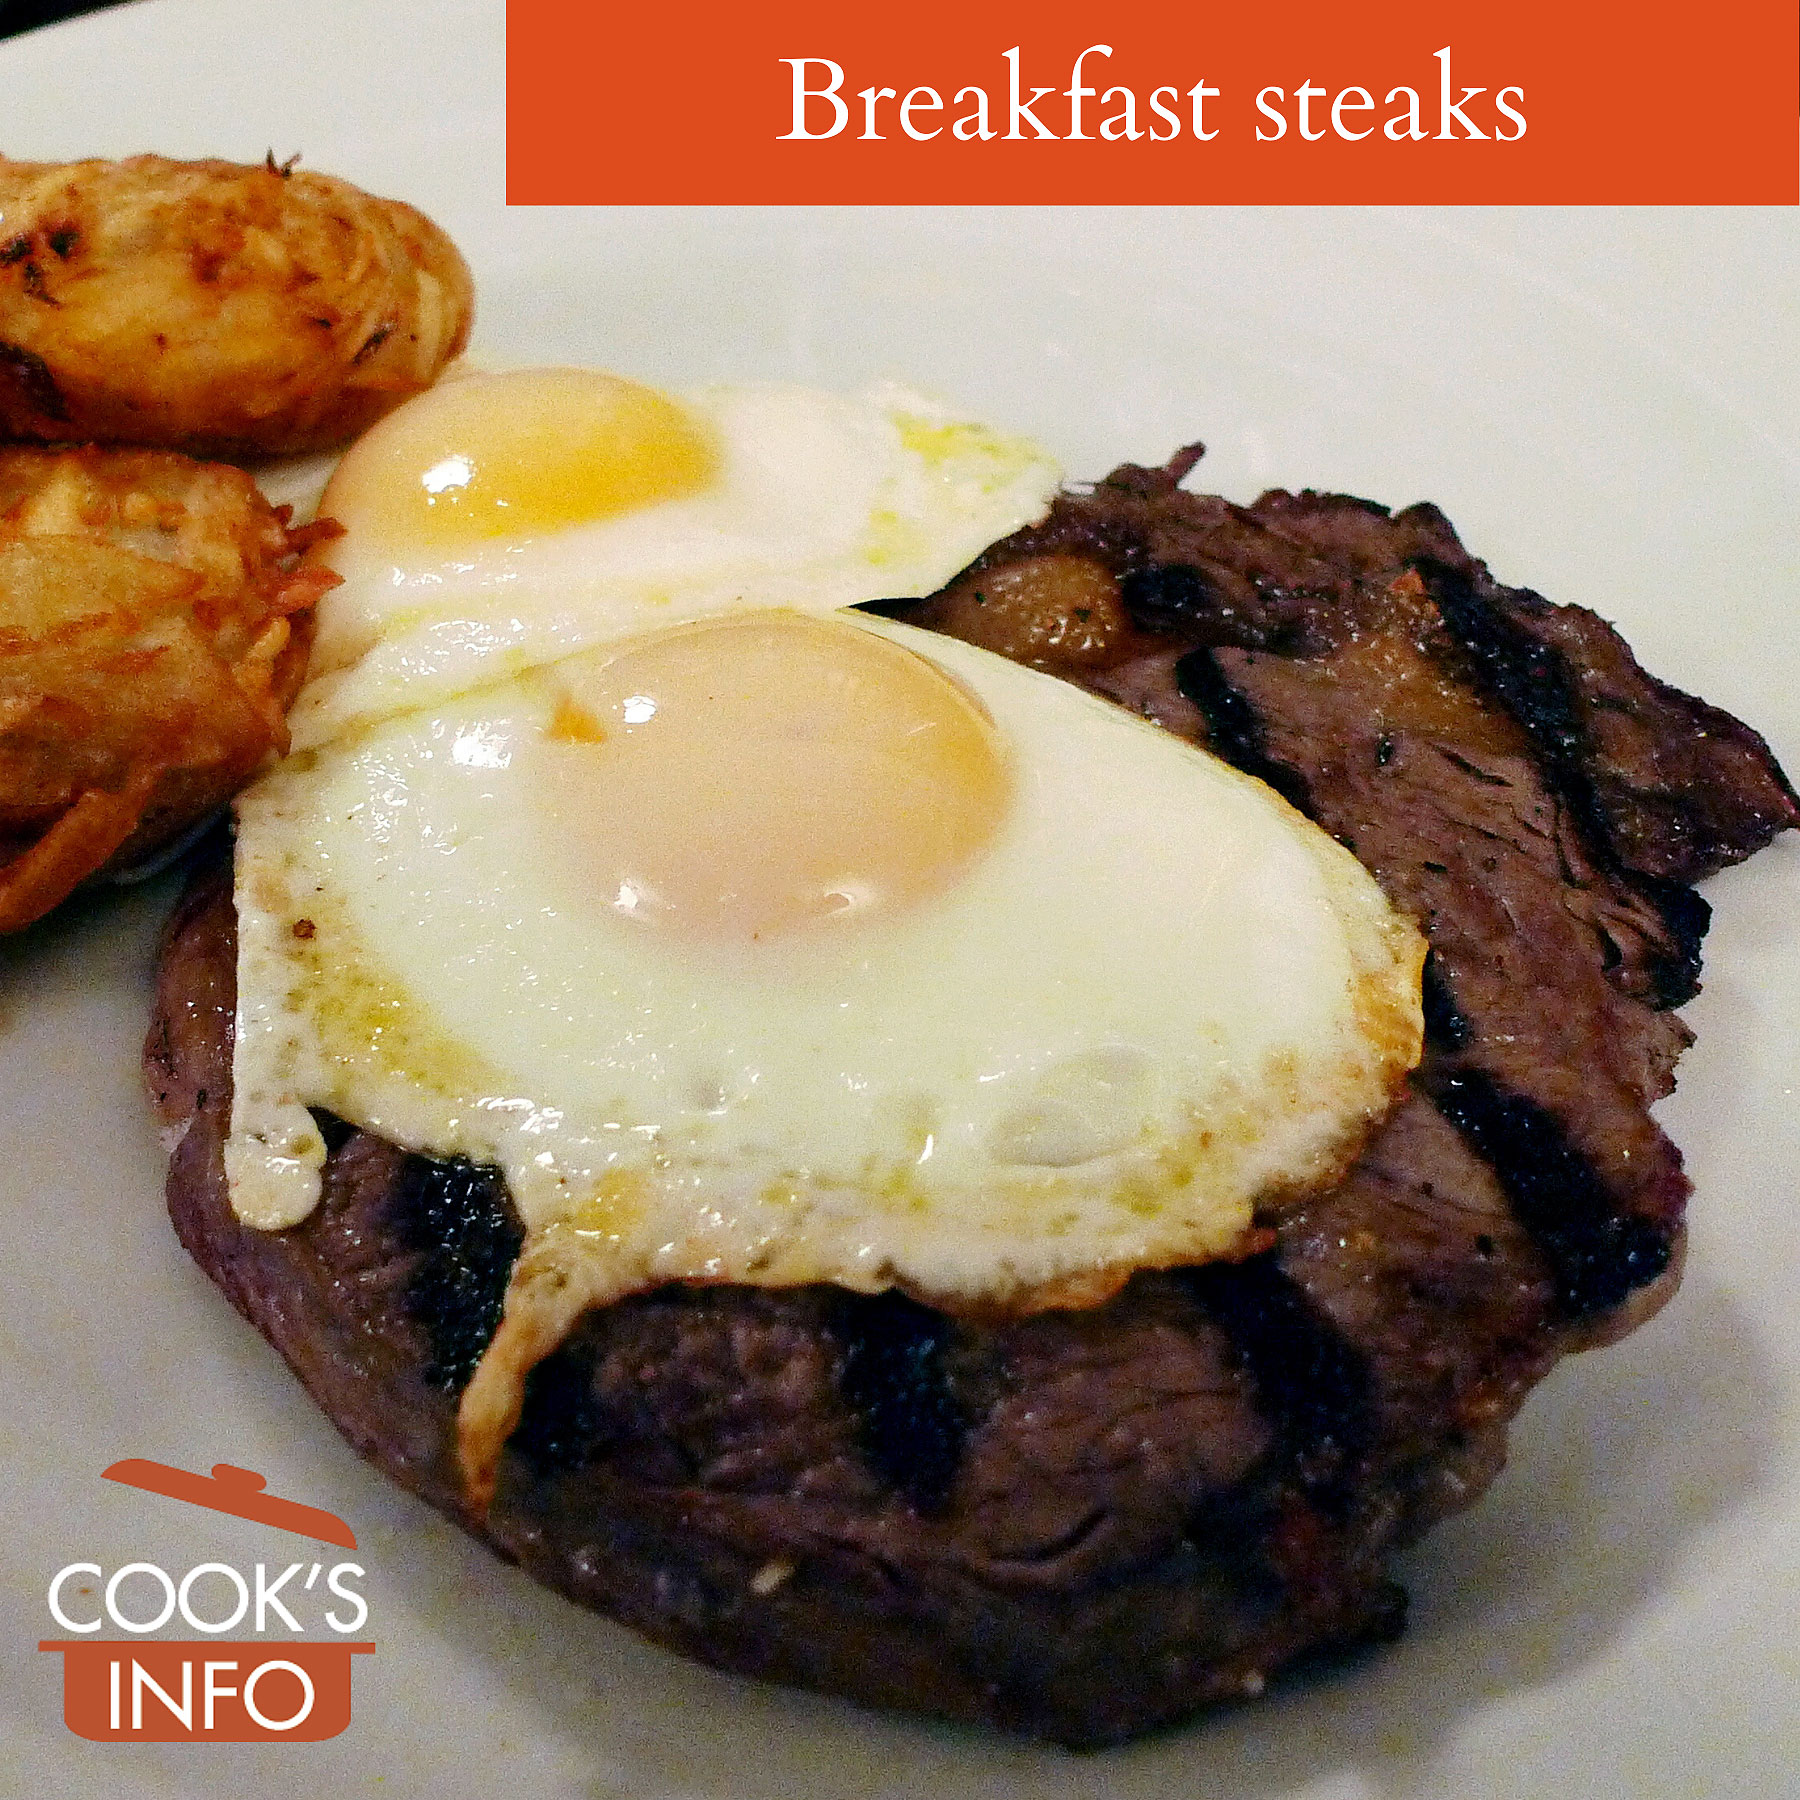 Breakfast steak with egg